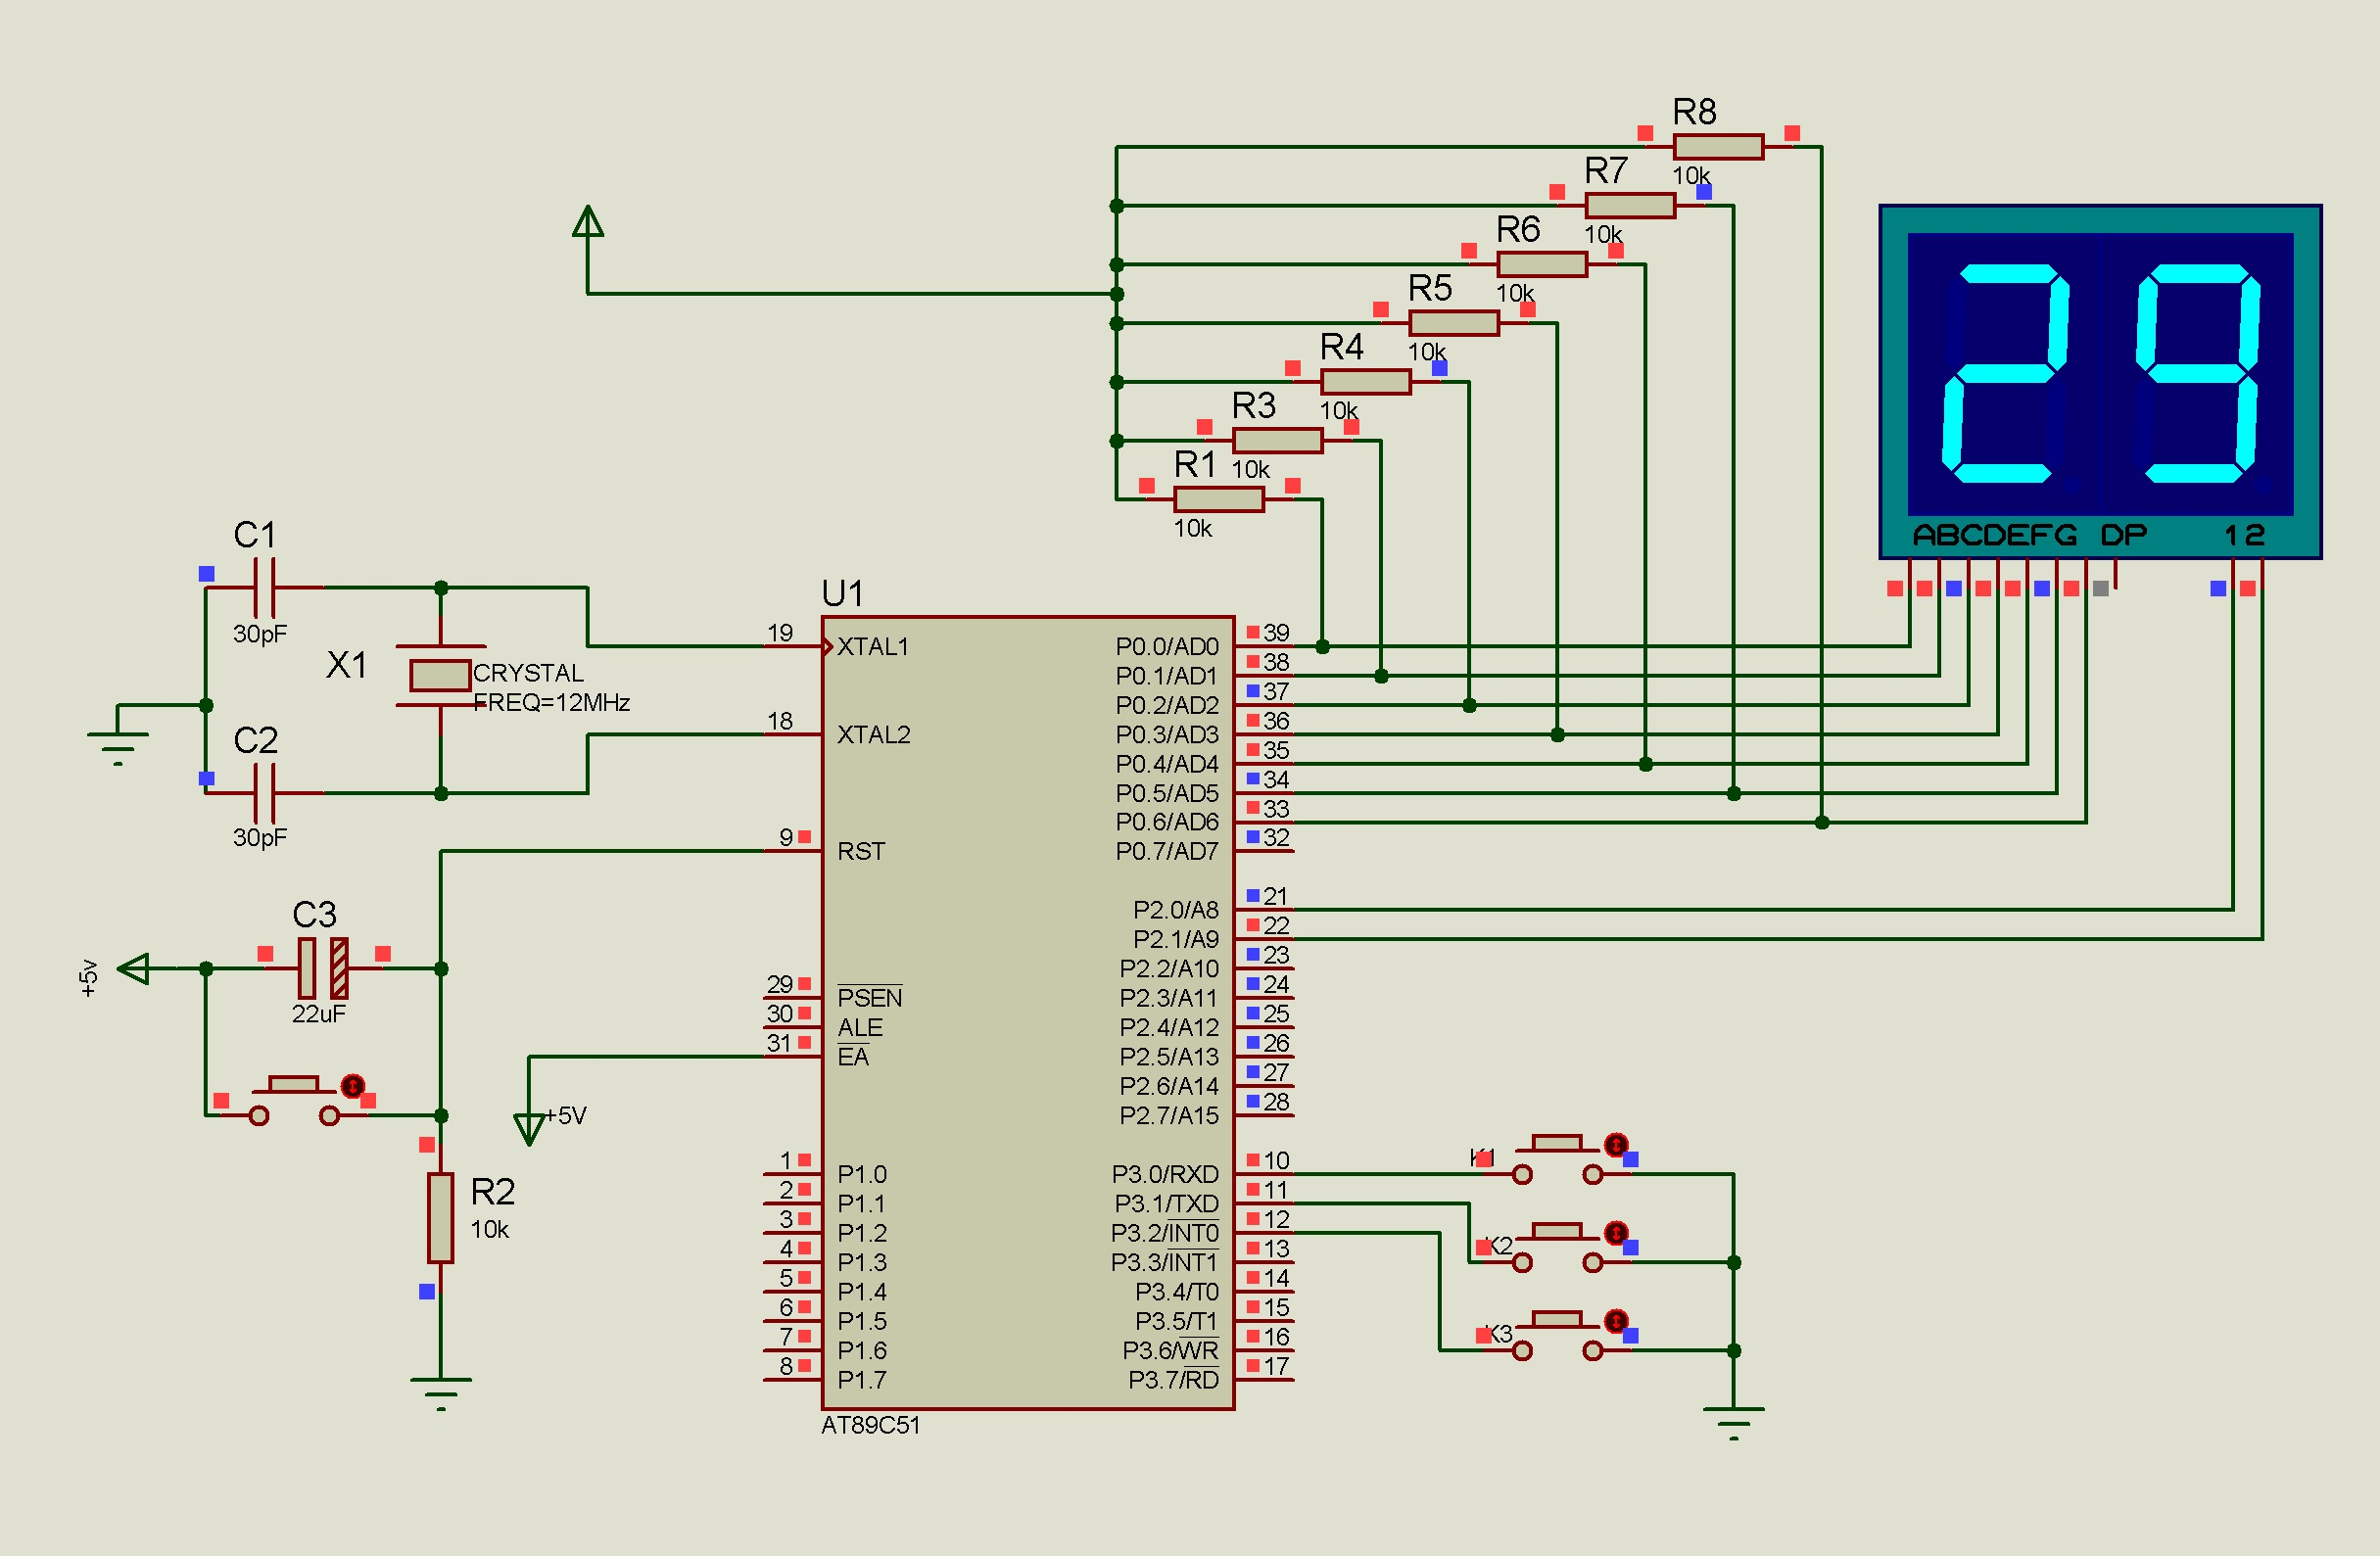 用AT89C51单片机控制8段LED数码管采用动态显示的方式显示出00000000(图1)  用AT89C51单片机控制8段LED数码管采用动态显示的方式显示出00000000(图2)  用AT89C51单片机控制8段LED数码管采用动态显示的方式显示出00000000(图3)  用AT89C51单片机控制8段LED数码管采用动态显示的方式显示出00000000(图4)  用AT89C51单片机控制8段LED数码管采用动态显示的方式显示出00000000(图5)  用AT89C51单片机控制8段LED数